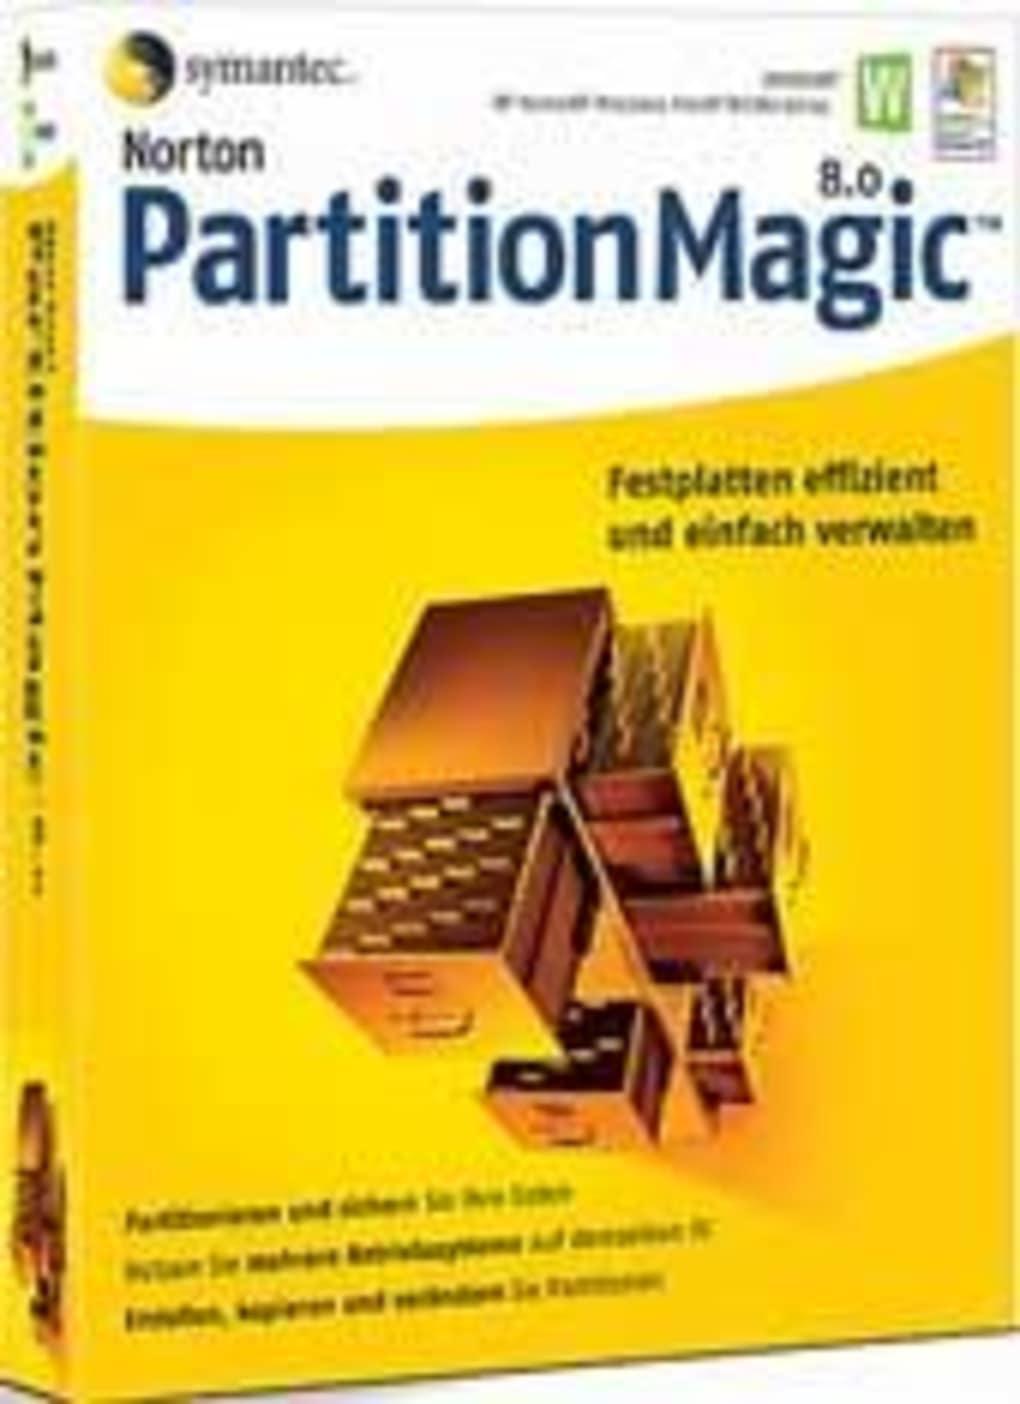 Norton Partition Magic - Download